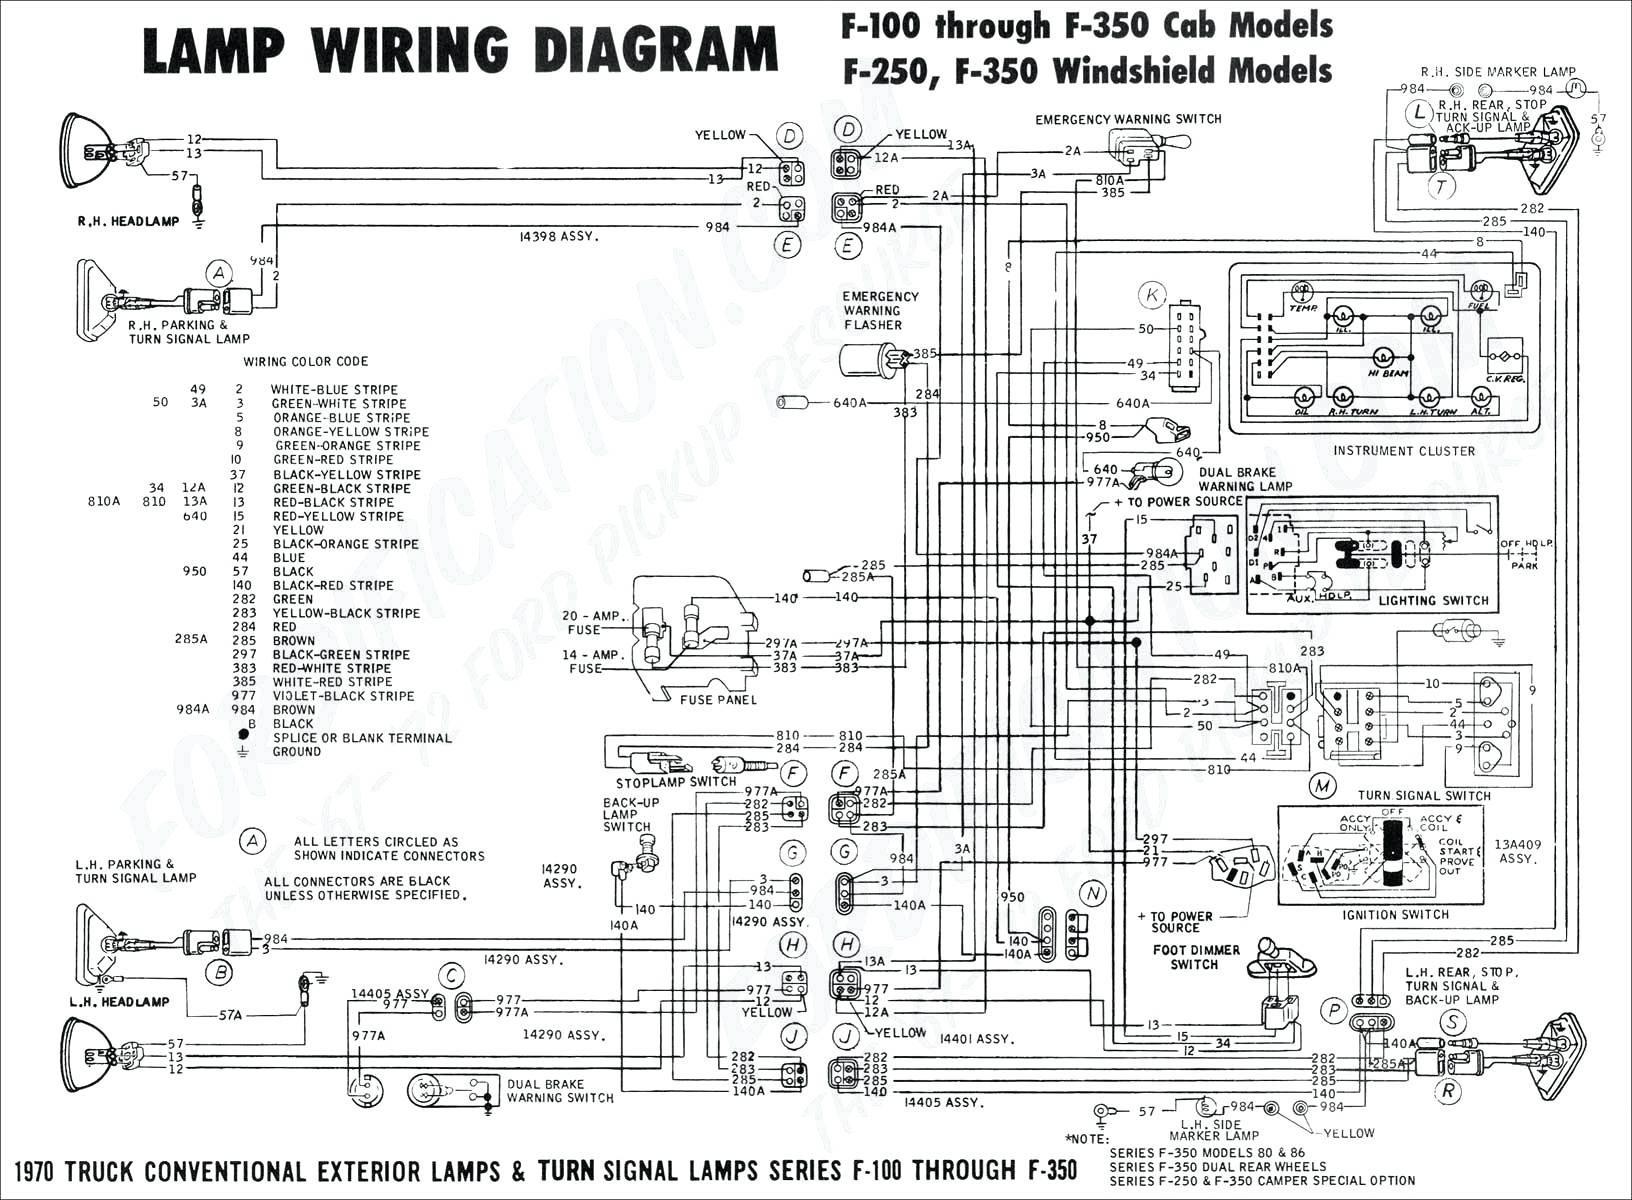 heartland rv wiring diagram collection wiring diagram sample